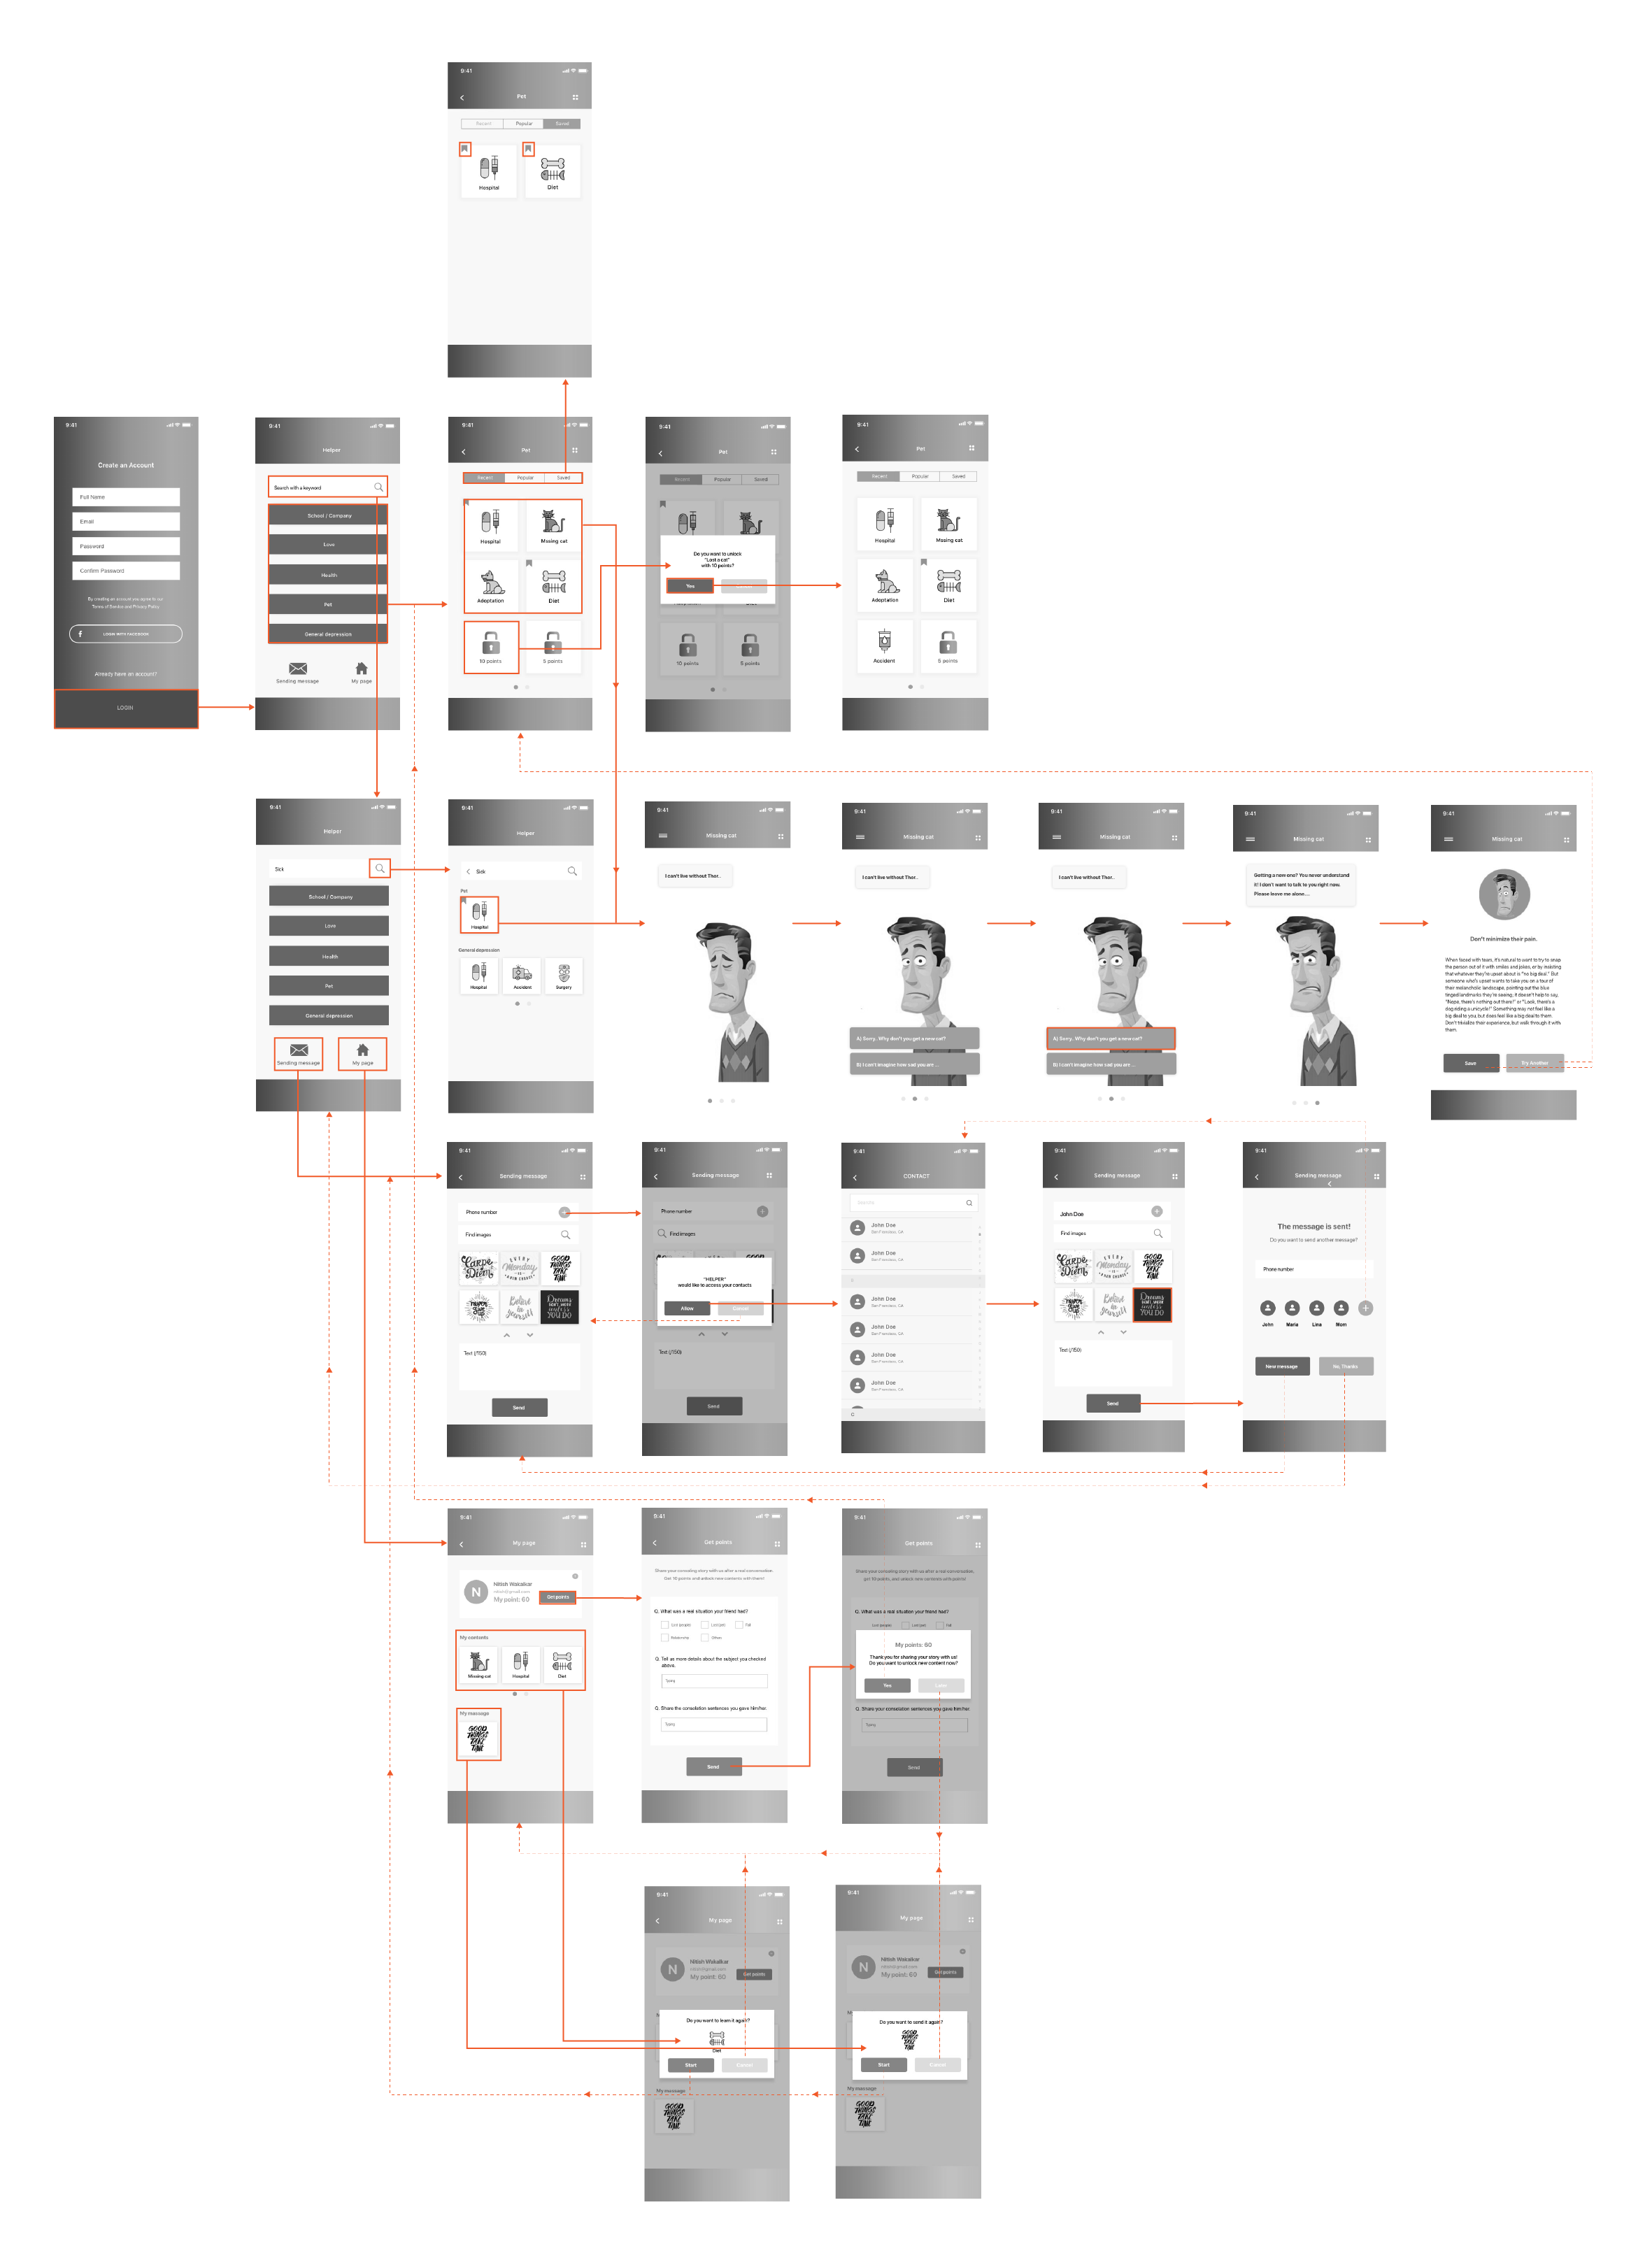 motionchat_architecture-23.png